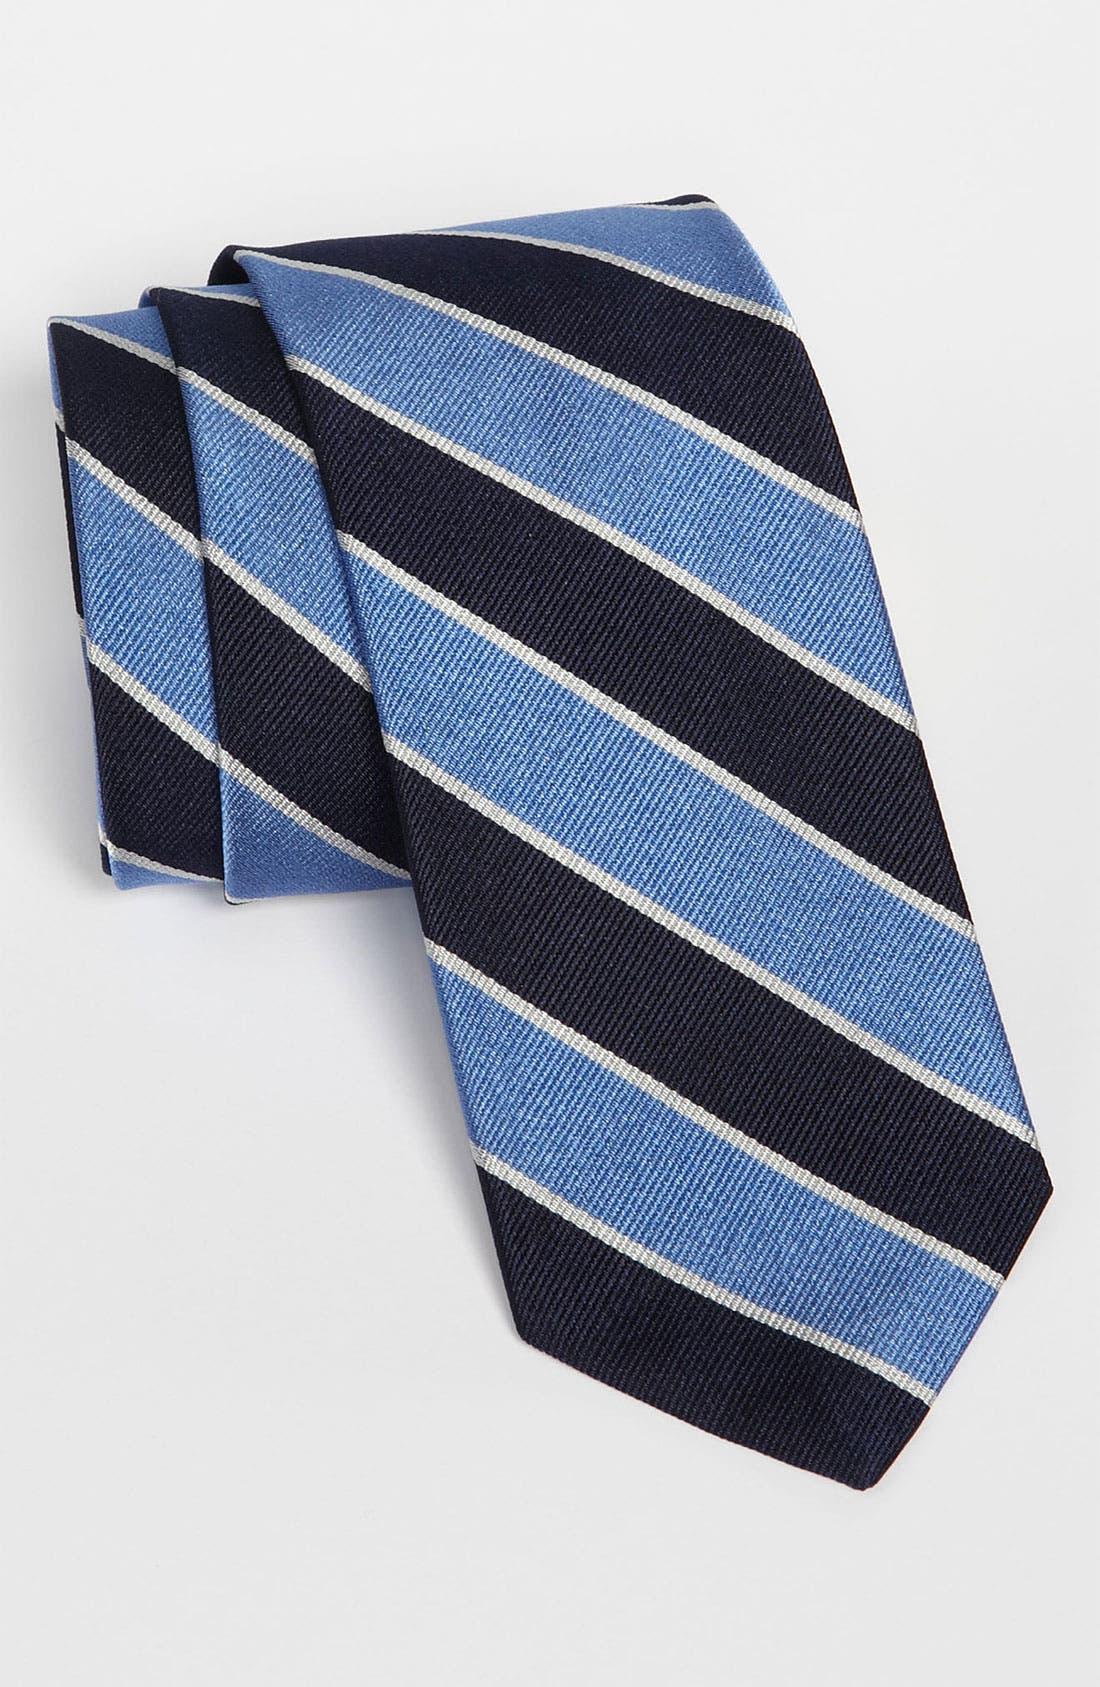 Main Image - Jack Spade Woven Silk Tie